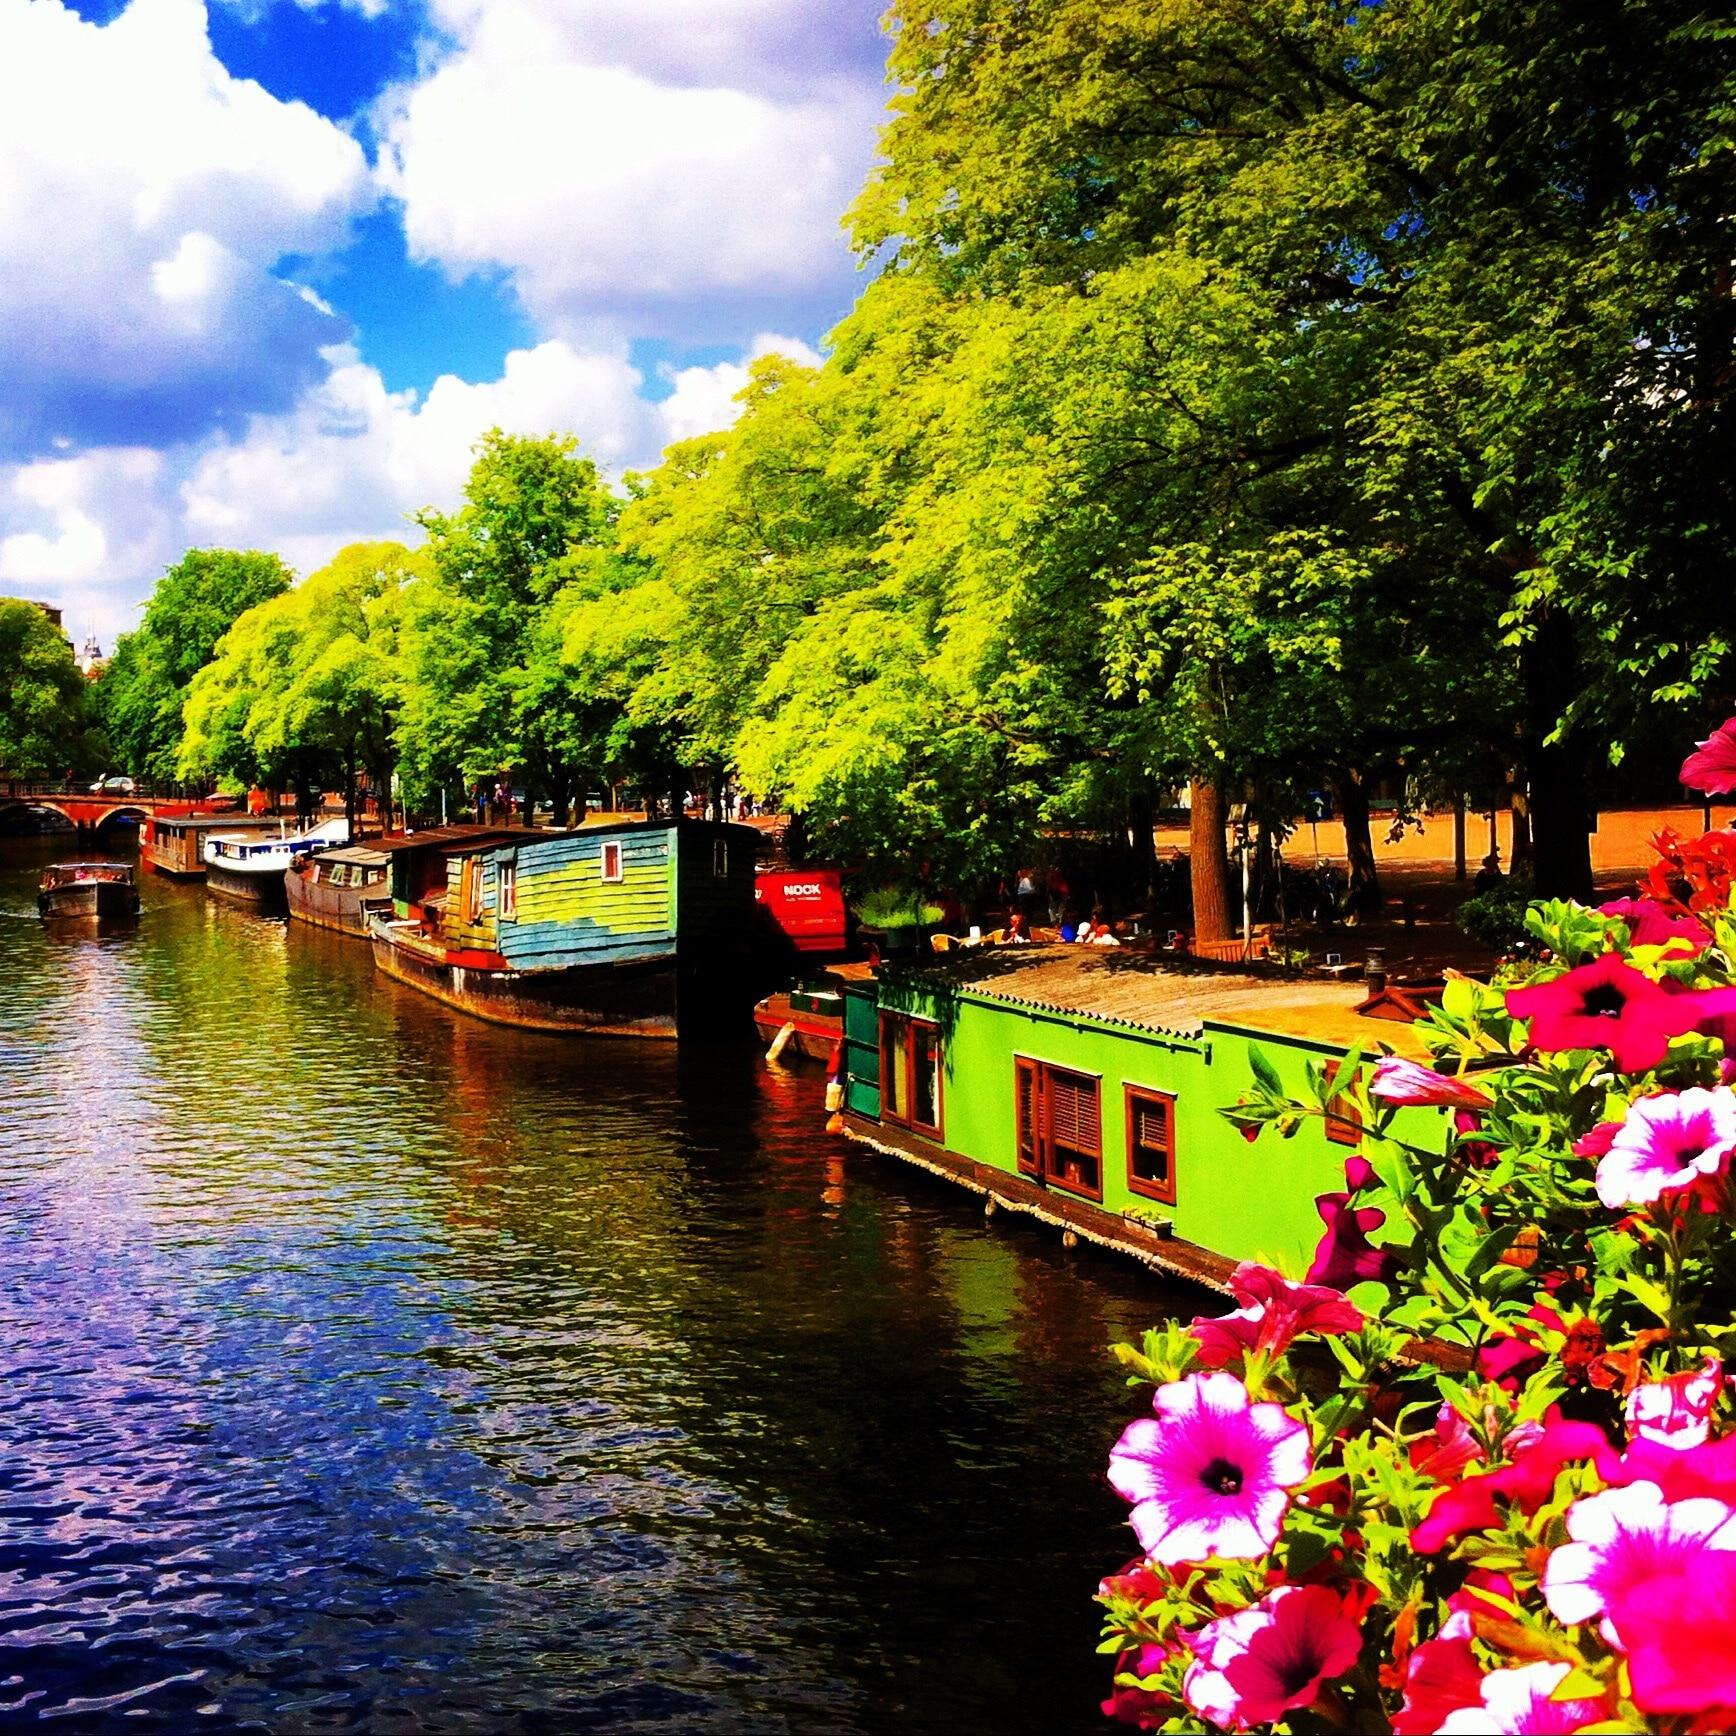 Bedrijventerrein Sloterdijk, Amsterdam, North Holland, Netherlands